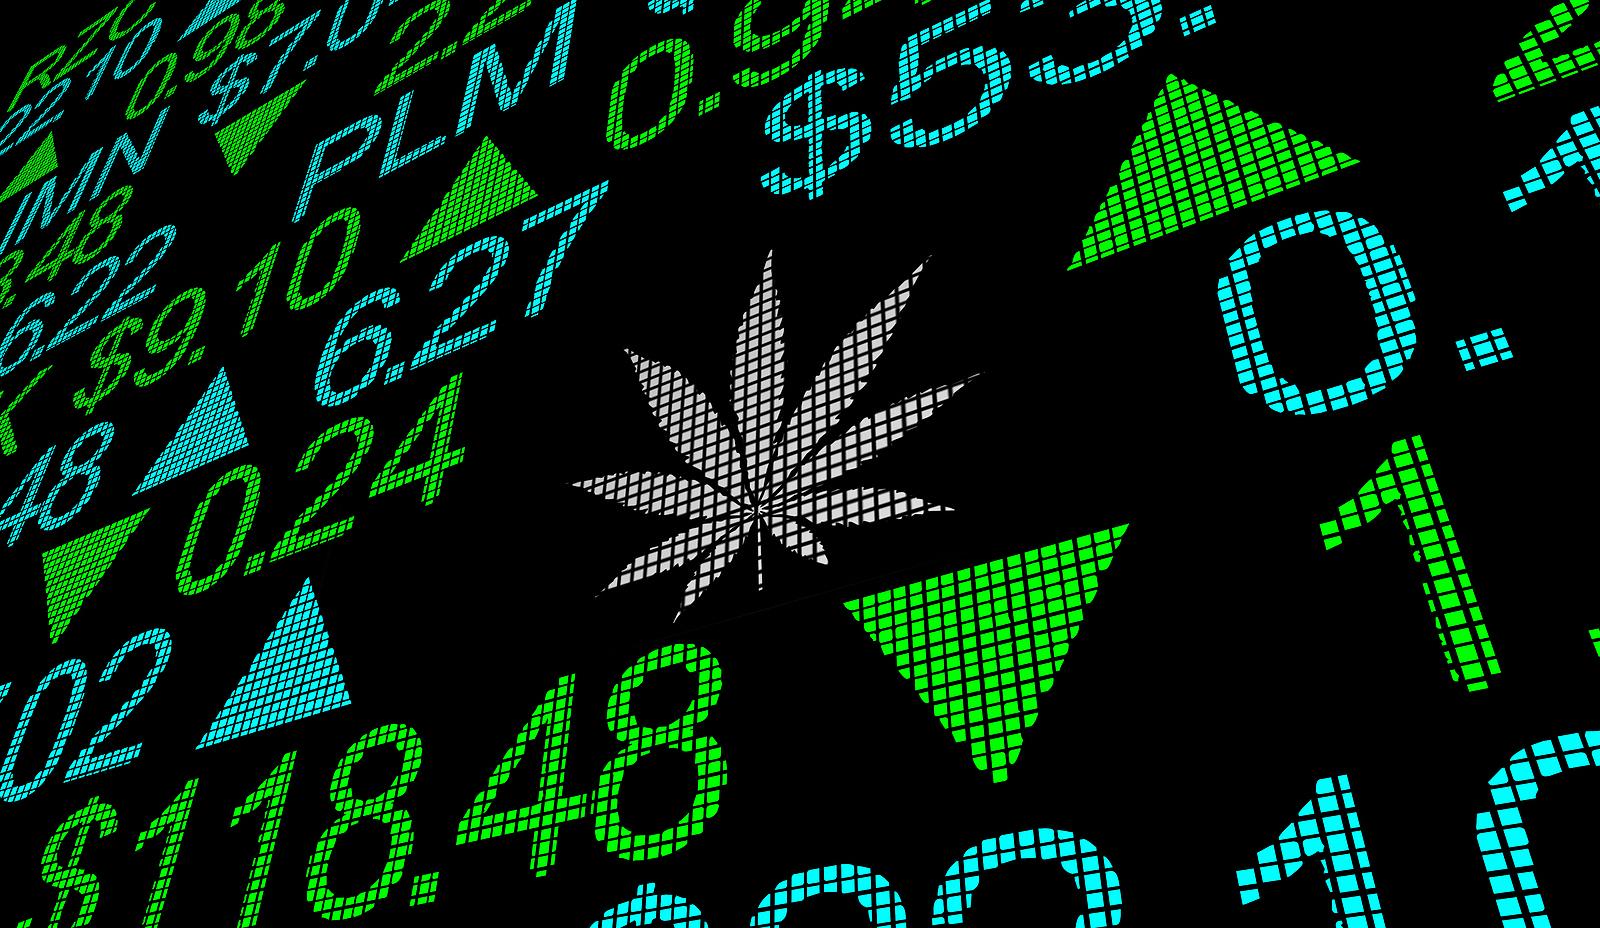 Cannabis stocks, marijuana stocks, pot stocks